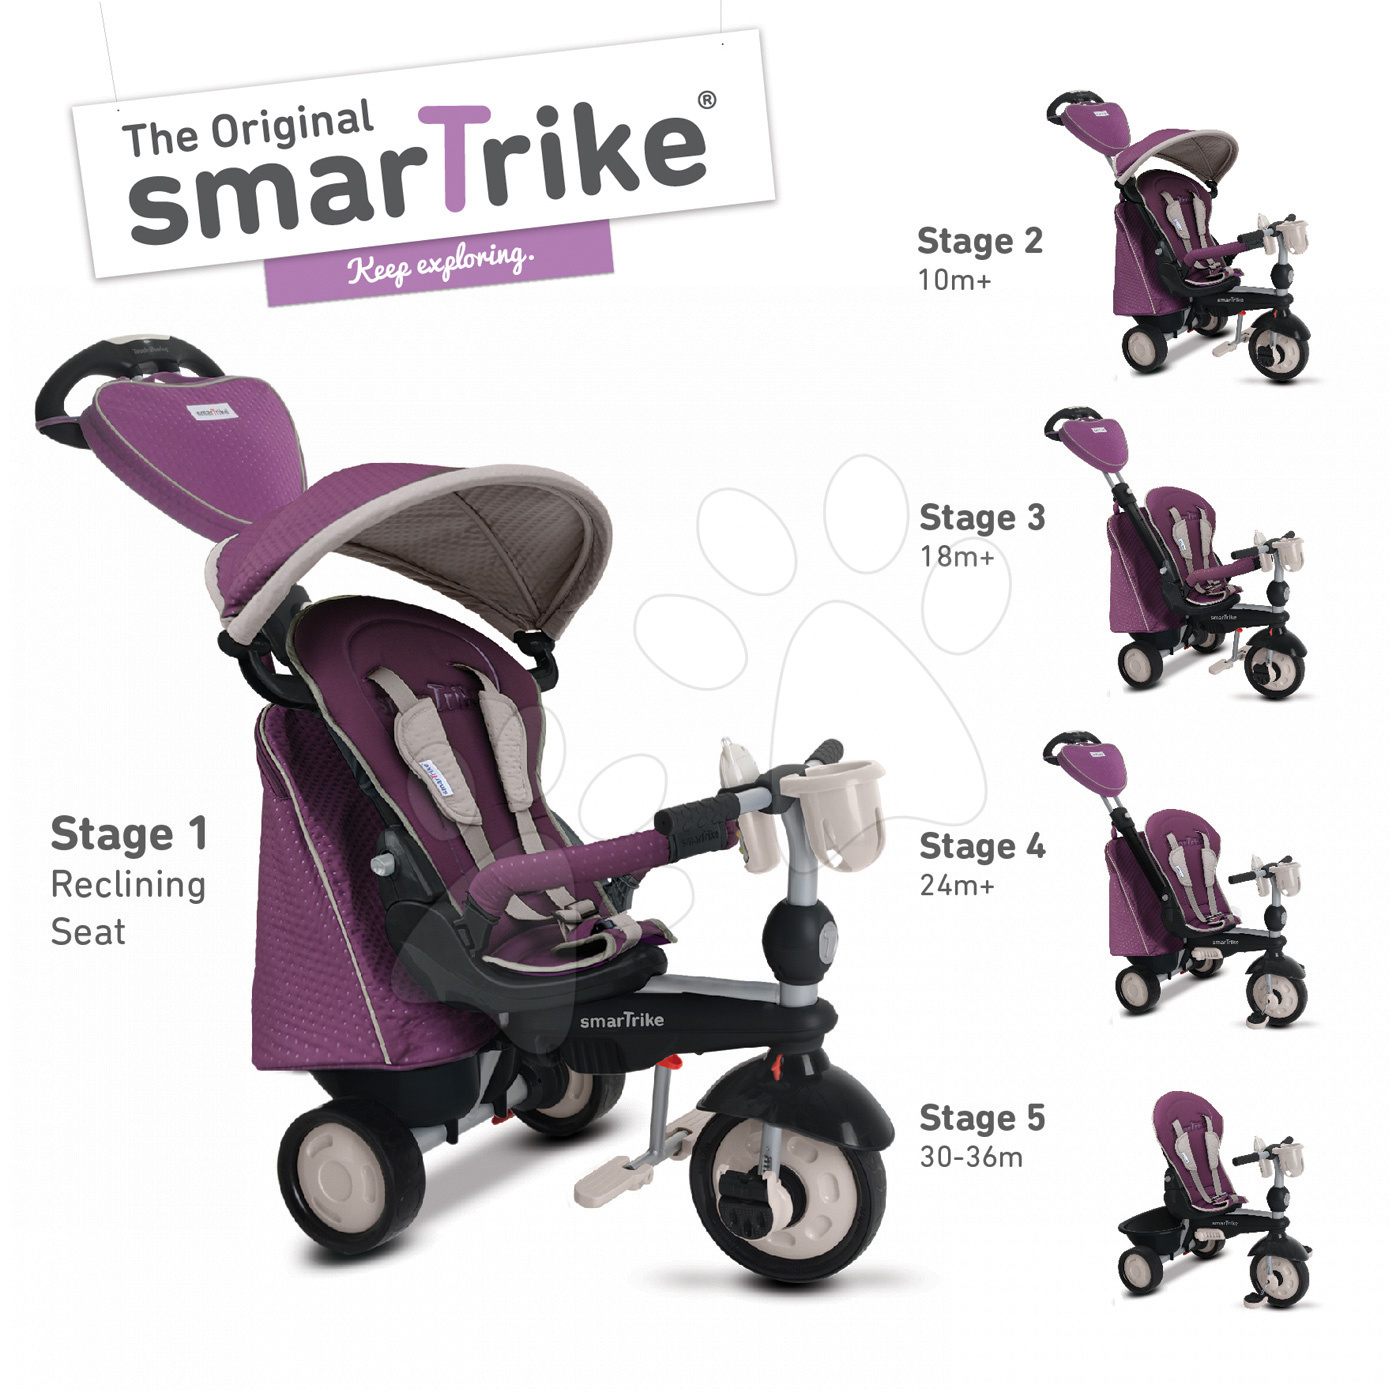 Trojkolky od 10 mesiacov - Trojkolka Recliner Infinity Purple smarTrike 5v1 TouchSteering fialovo-šedá od 10 mes